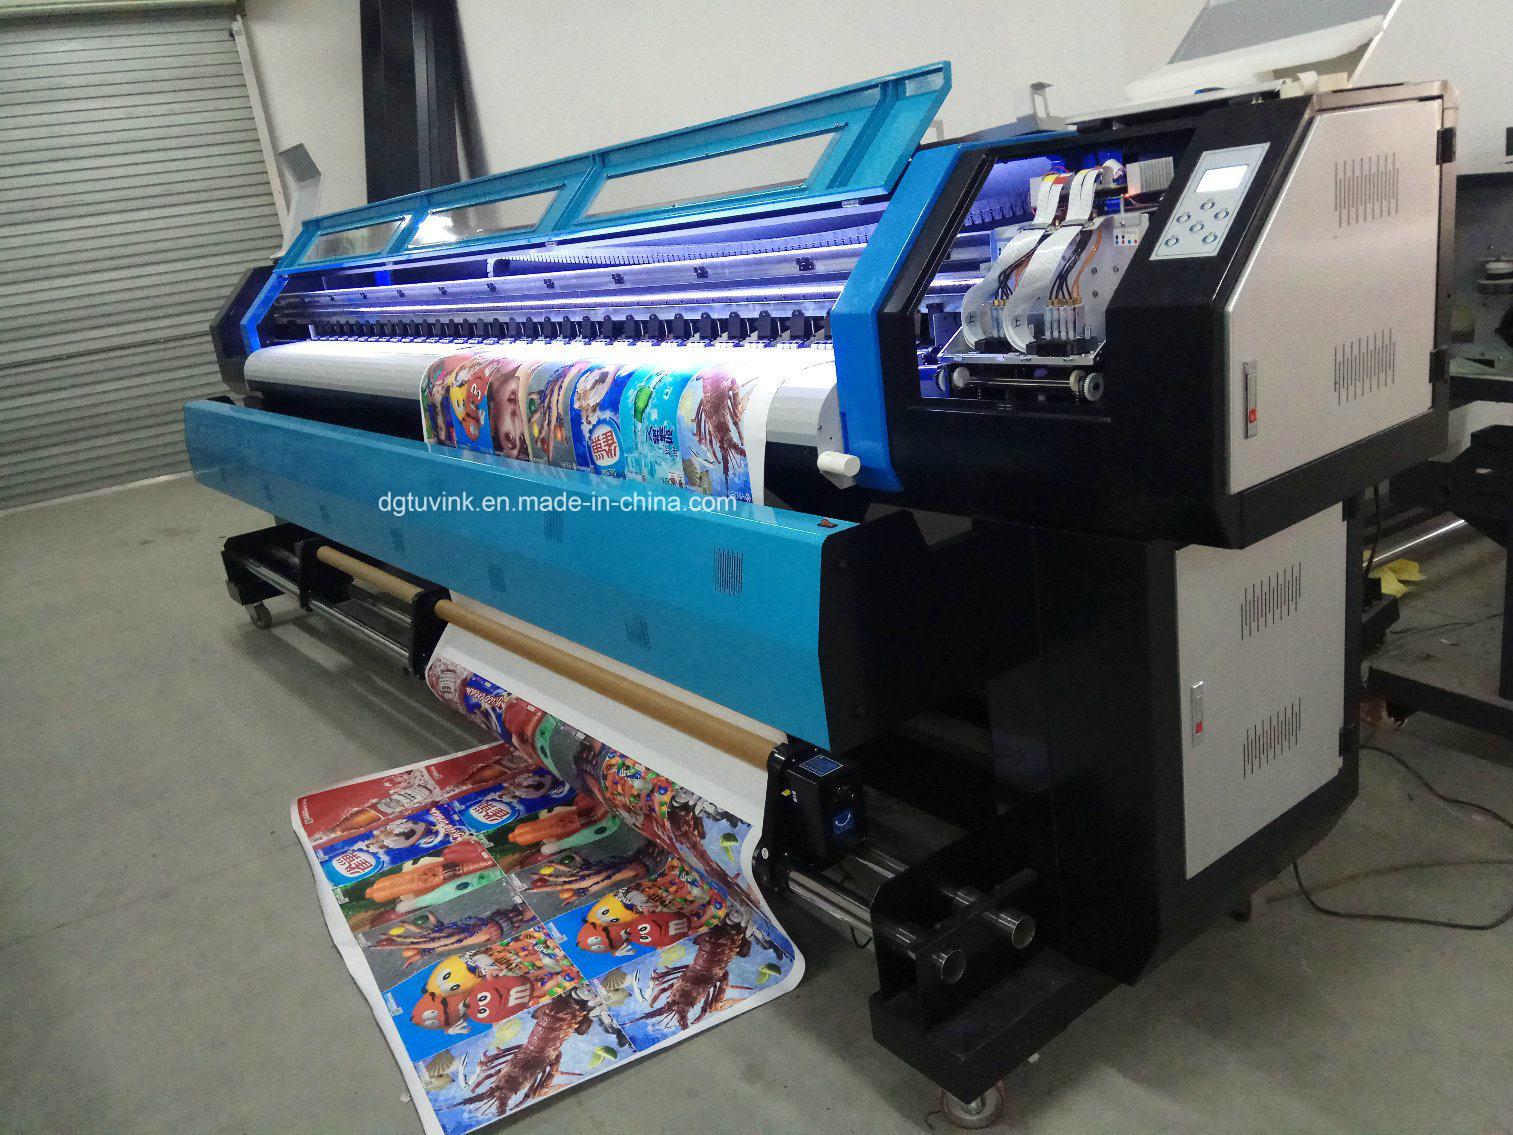 T shirt printing machine price in kenya chad crowley productions t shirt printing machine price in kenya reheart Images